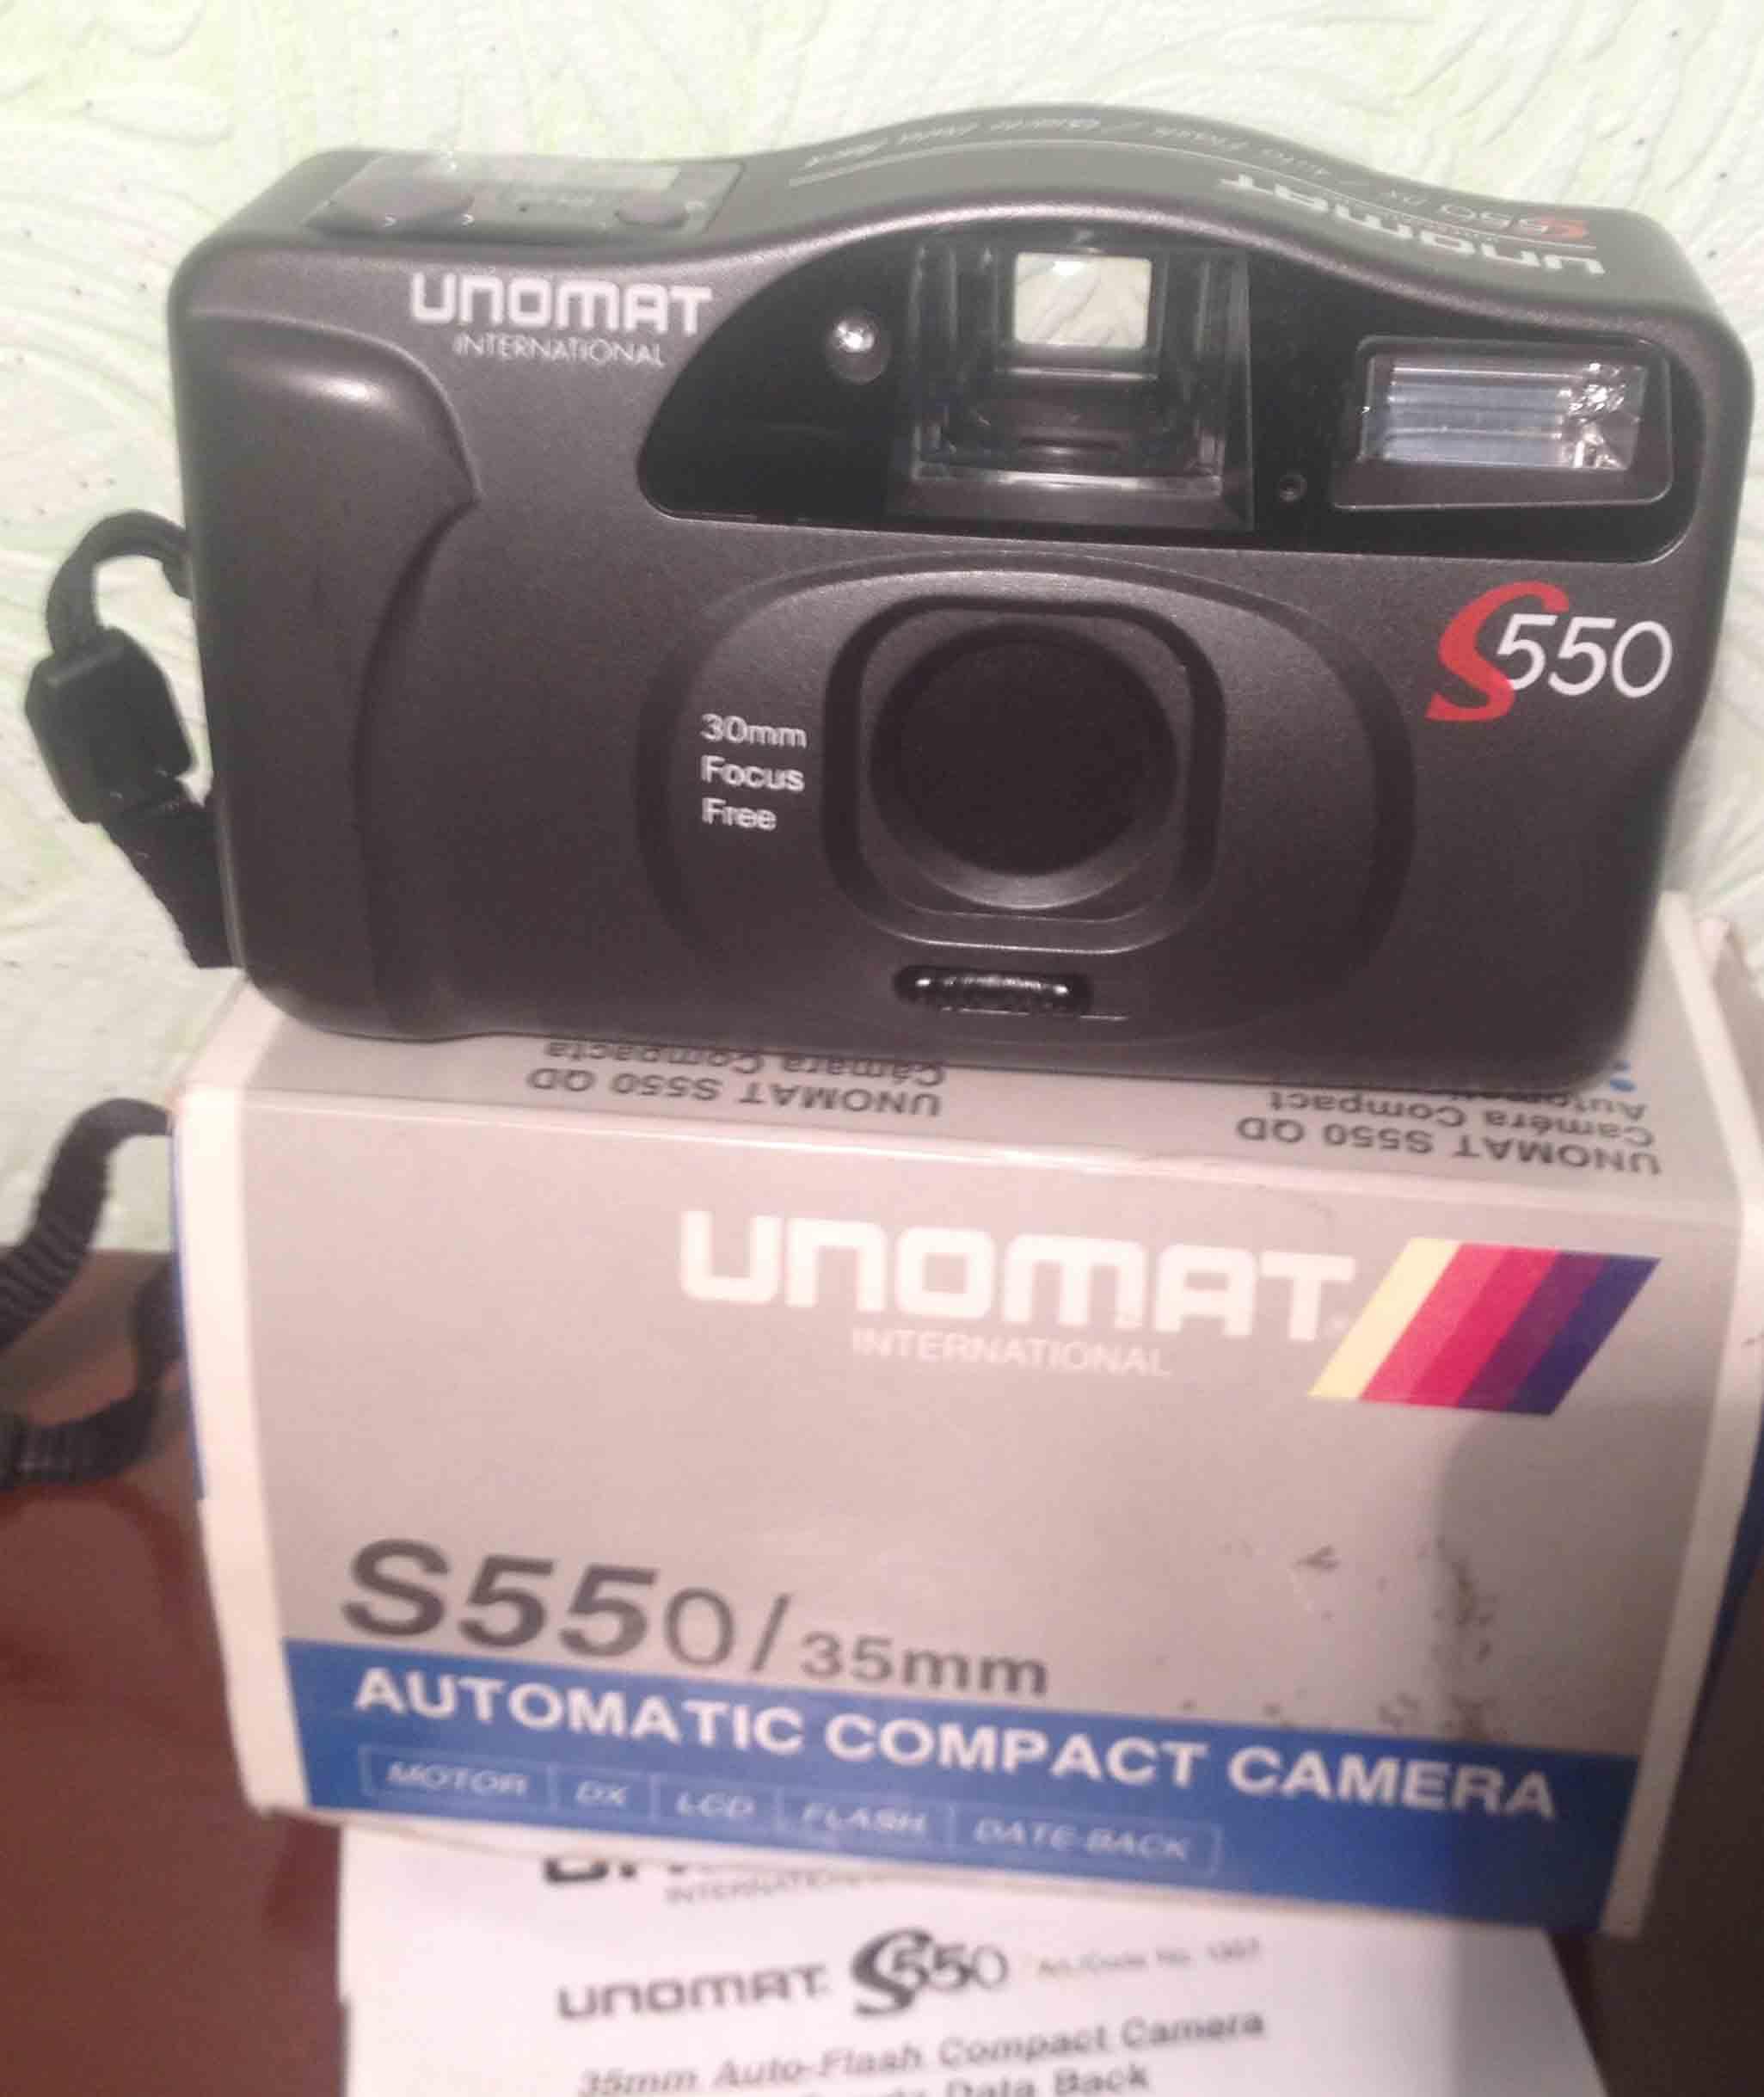 Фотоаппарат  UNOMAT  S 550 international фото 1